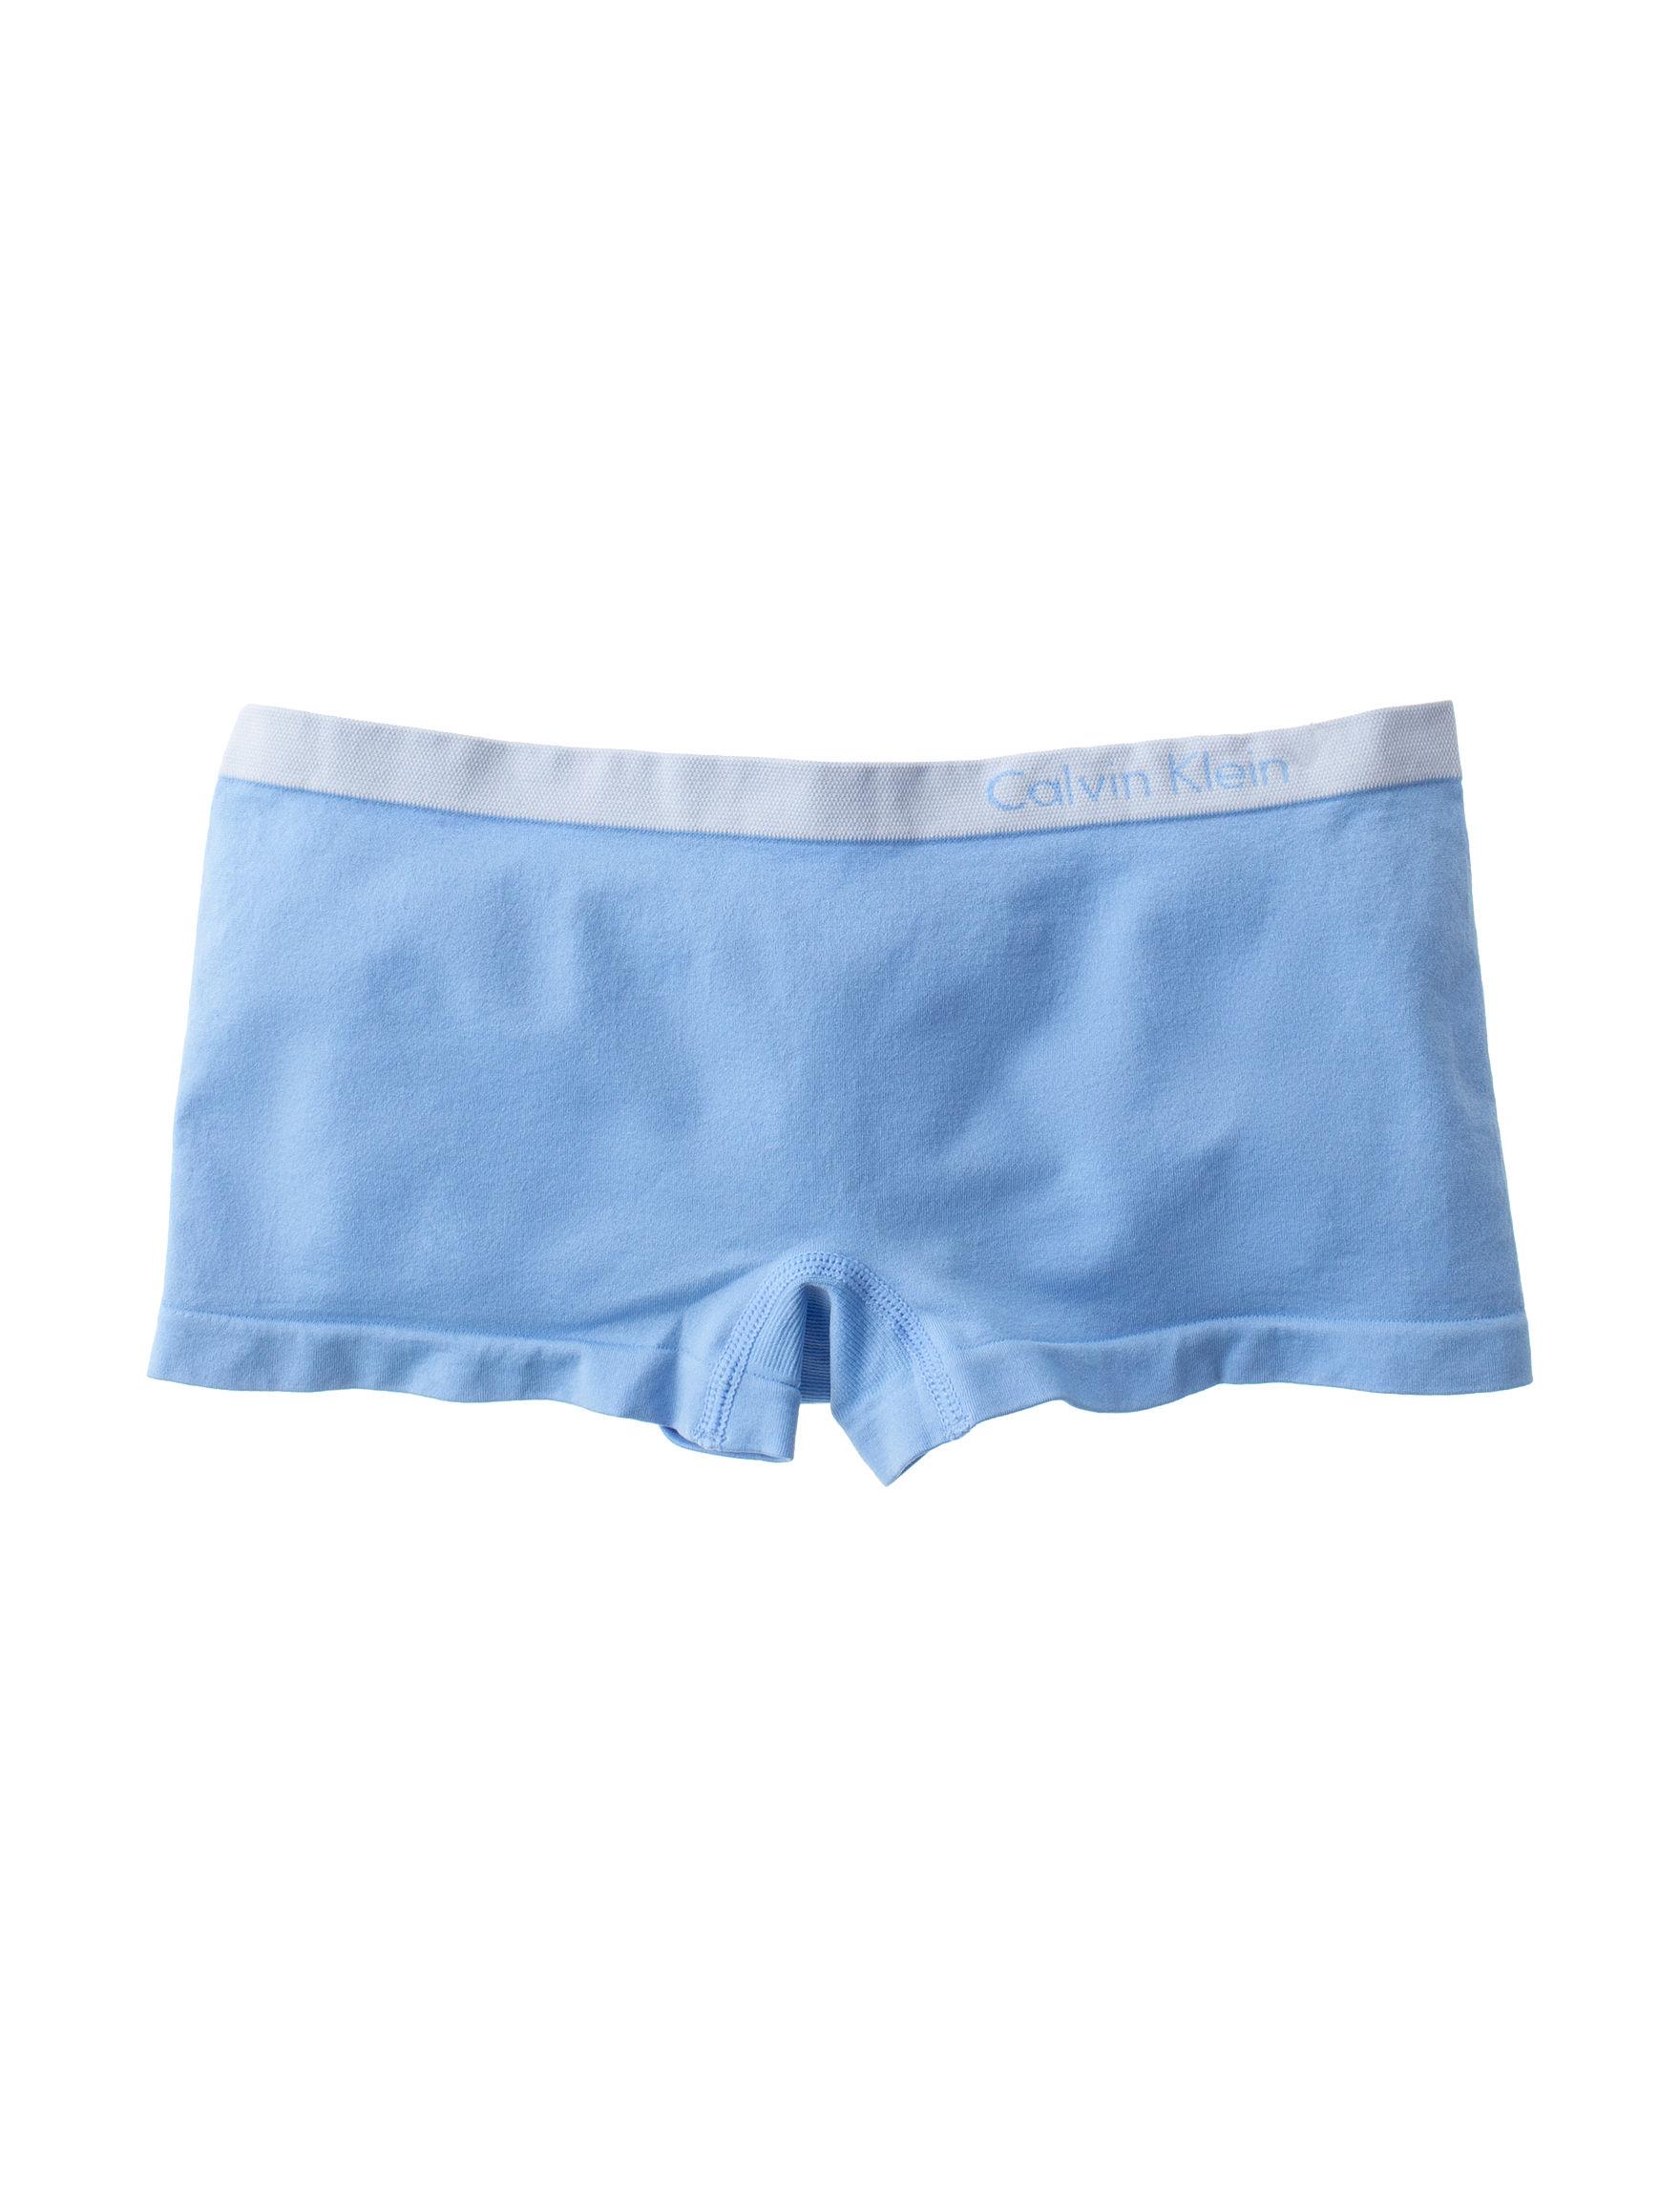 Calvin Klein Blue Panties Boyshort Seamless